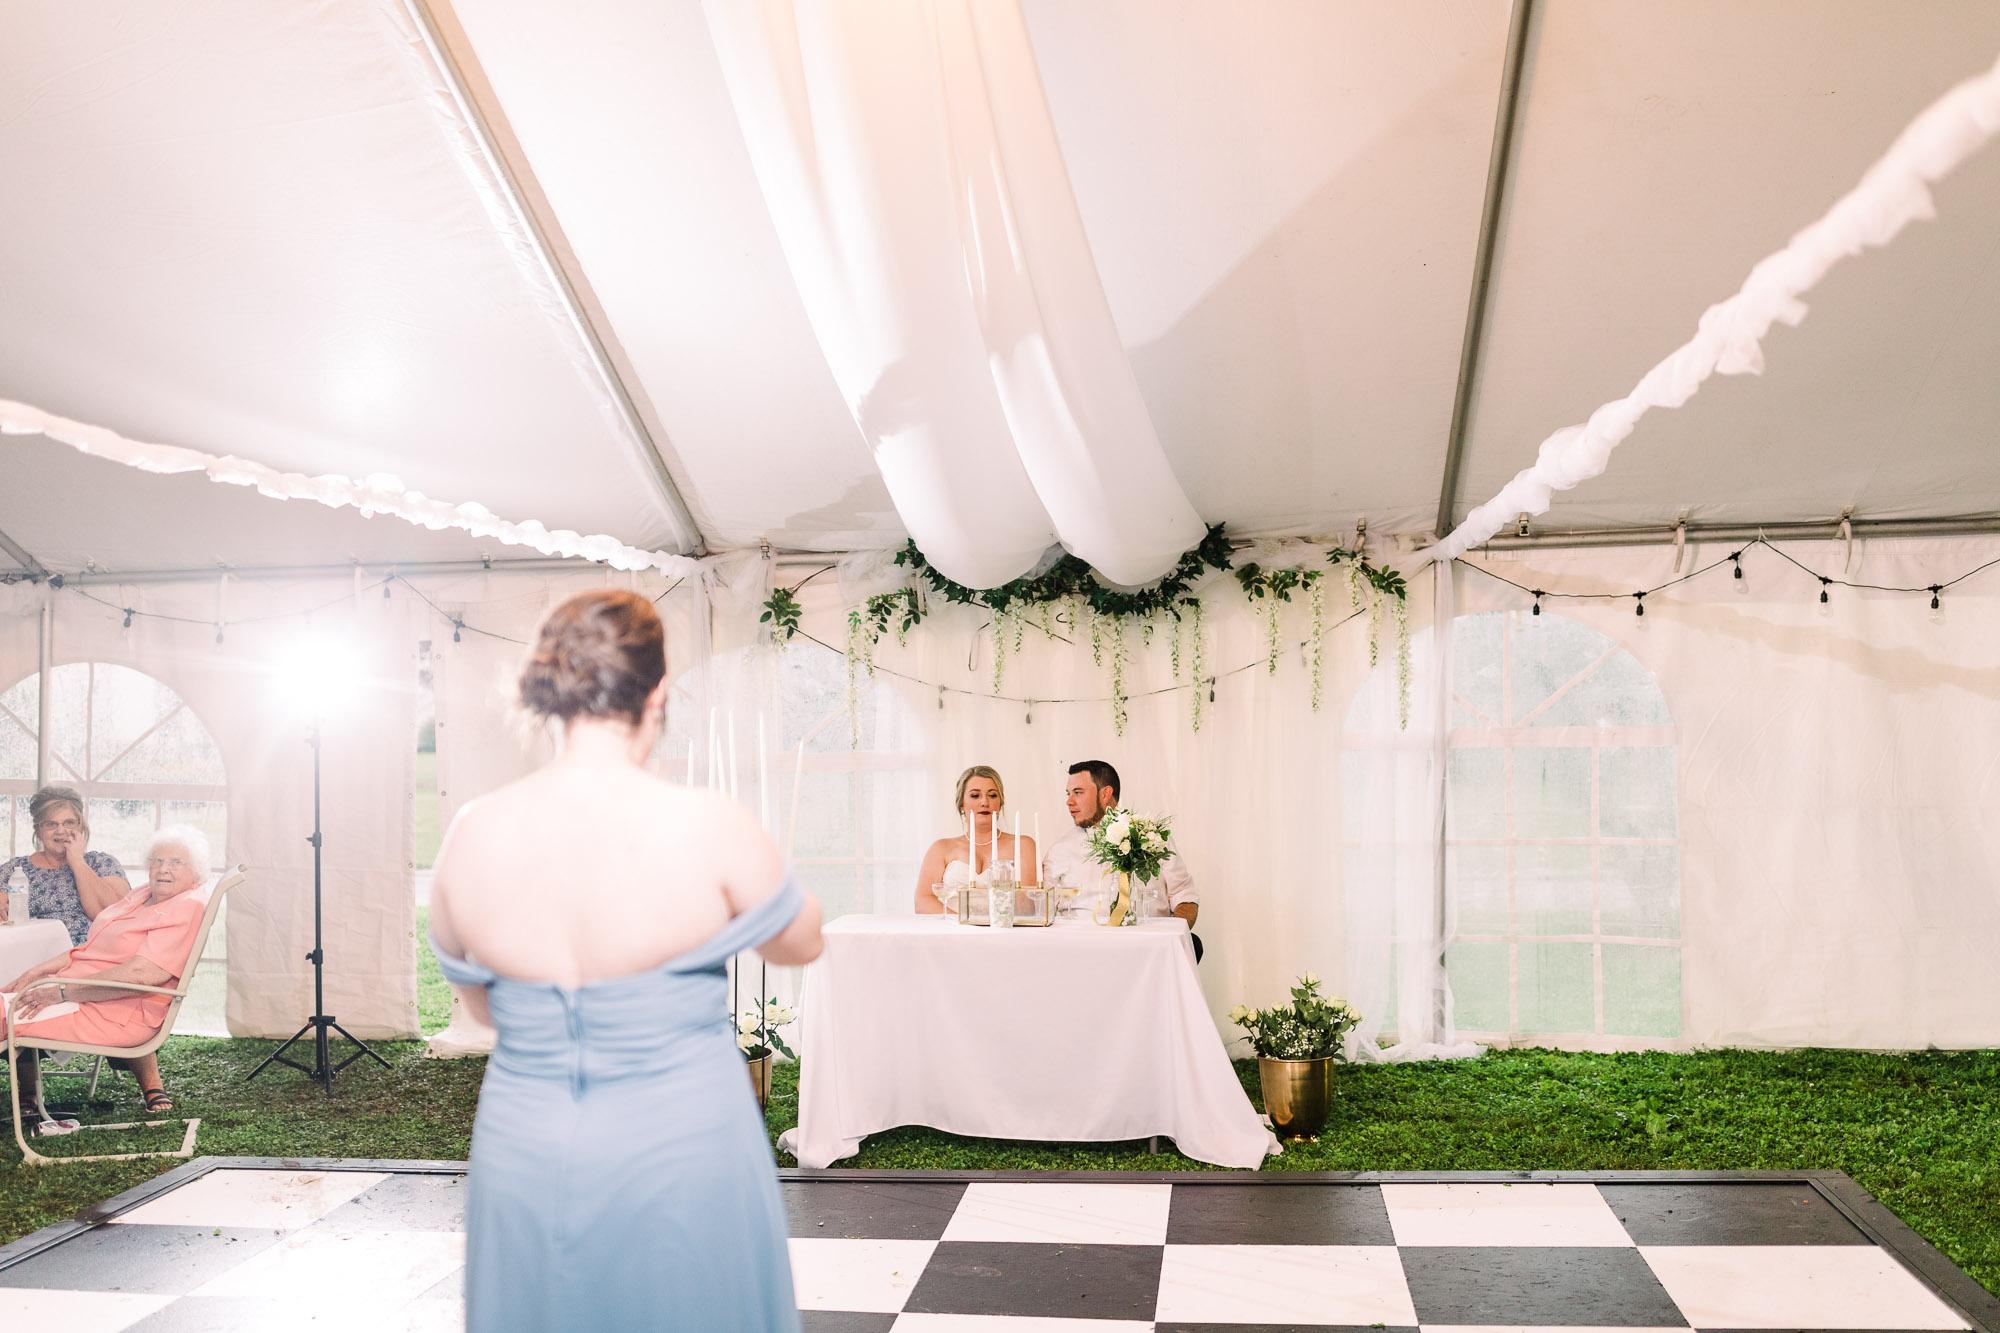 isle-of-que-wedding-7169.jpg